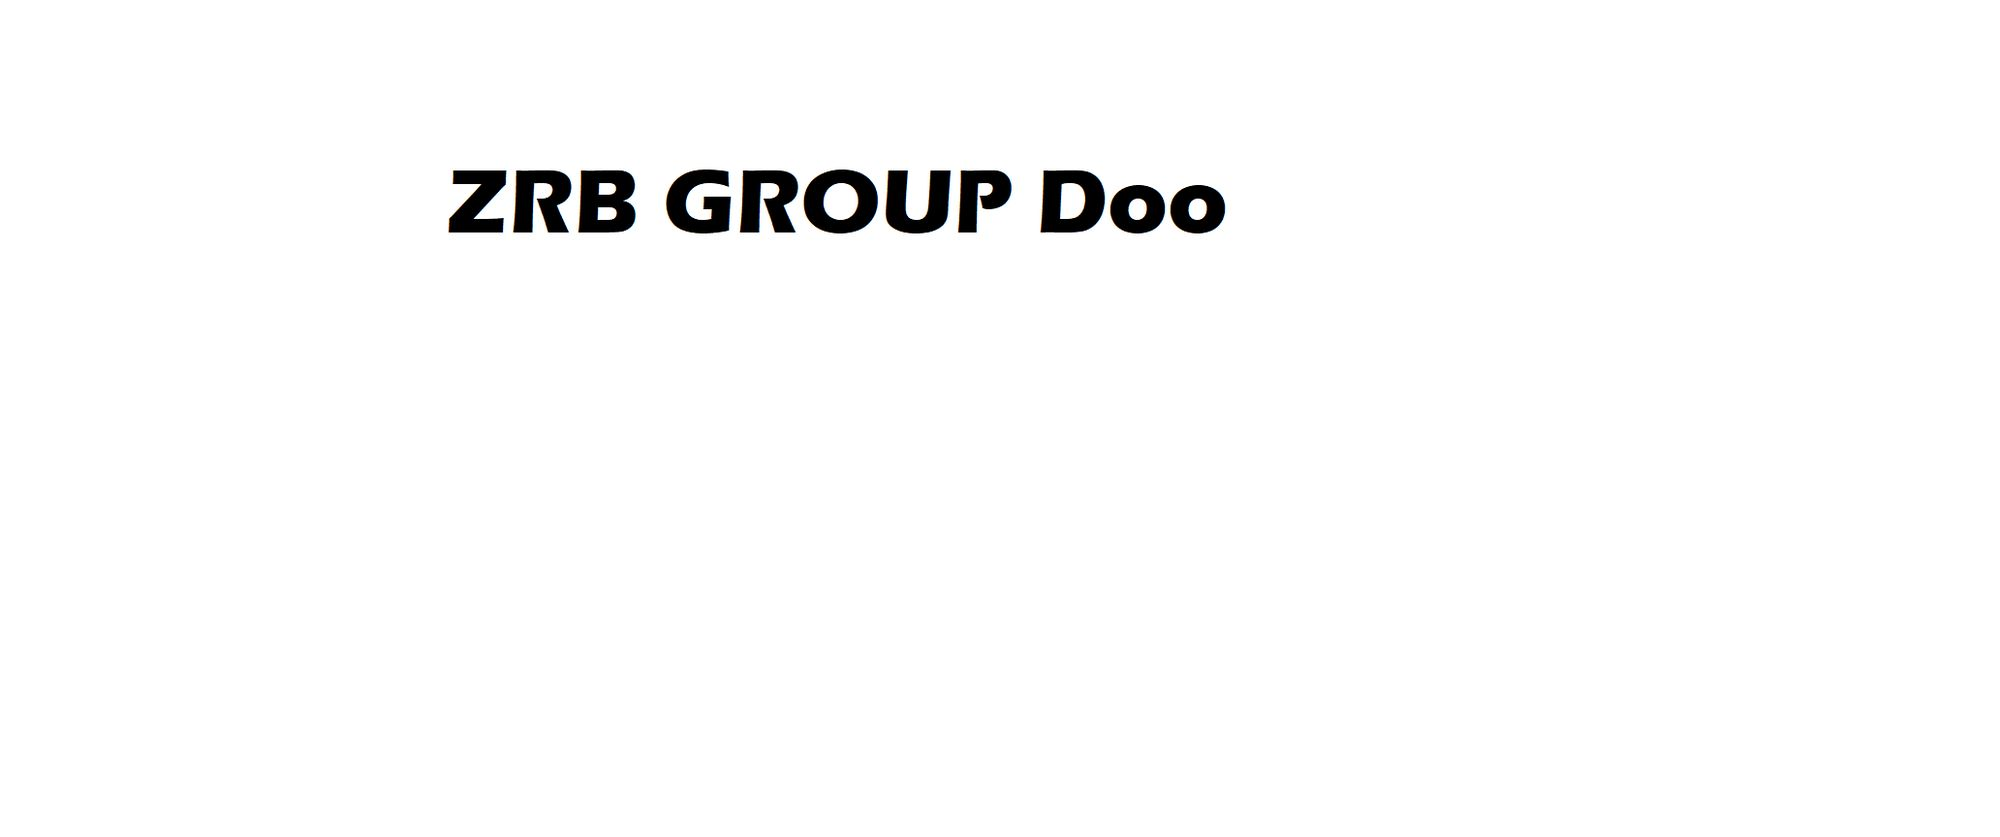 ZRB Group Doo